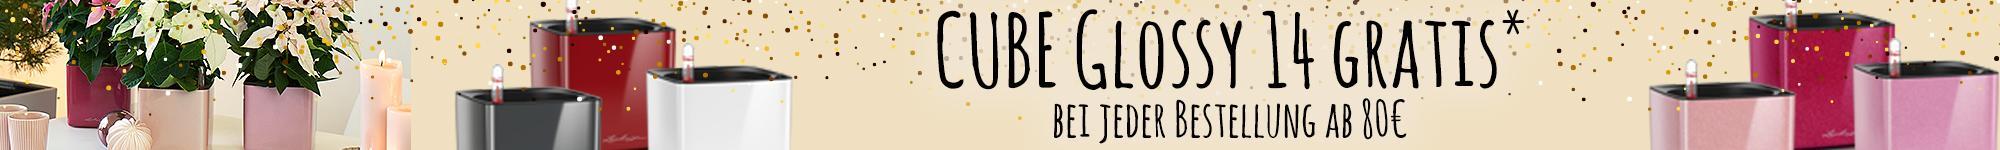 le_listing_banner_cube-glossy_de